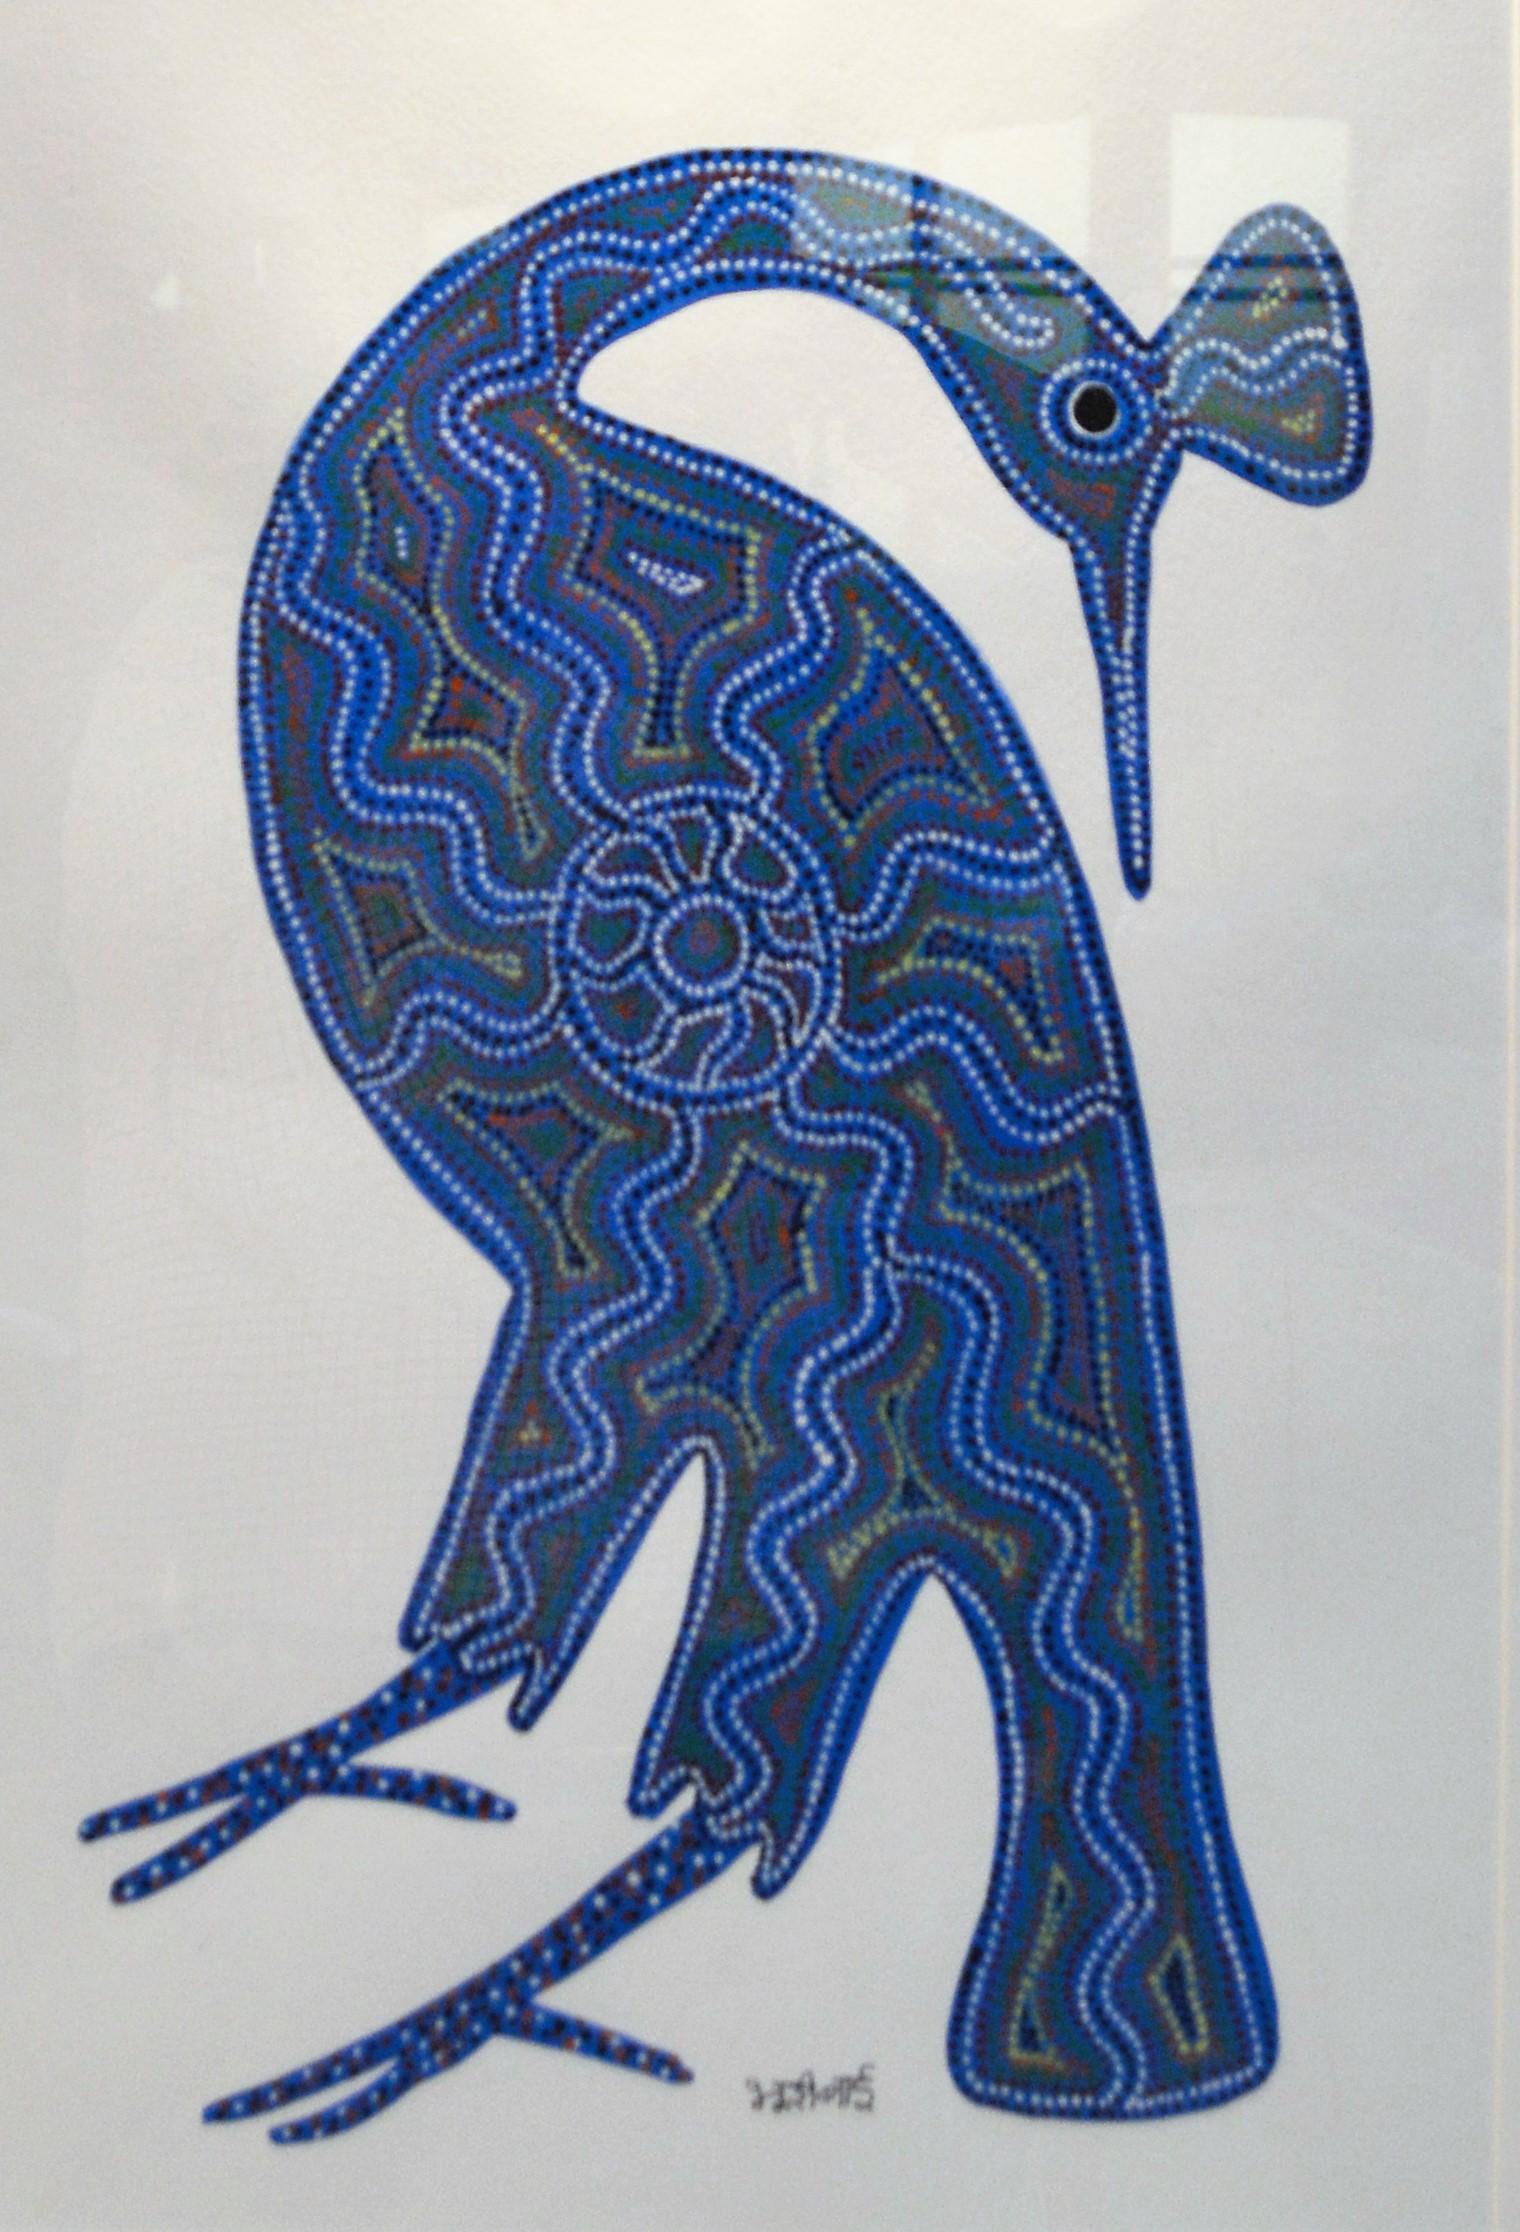 Bhuri Bai, Untitled, acrylic on paper, 48x33cm, 2014.jpg